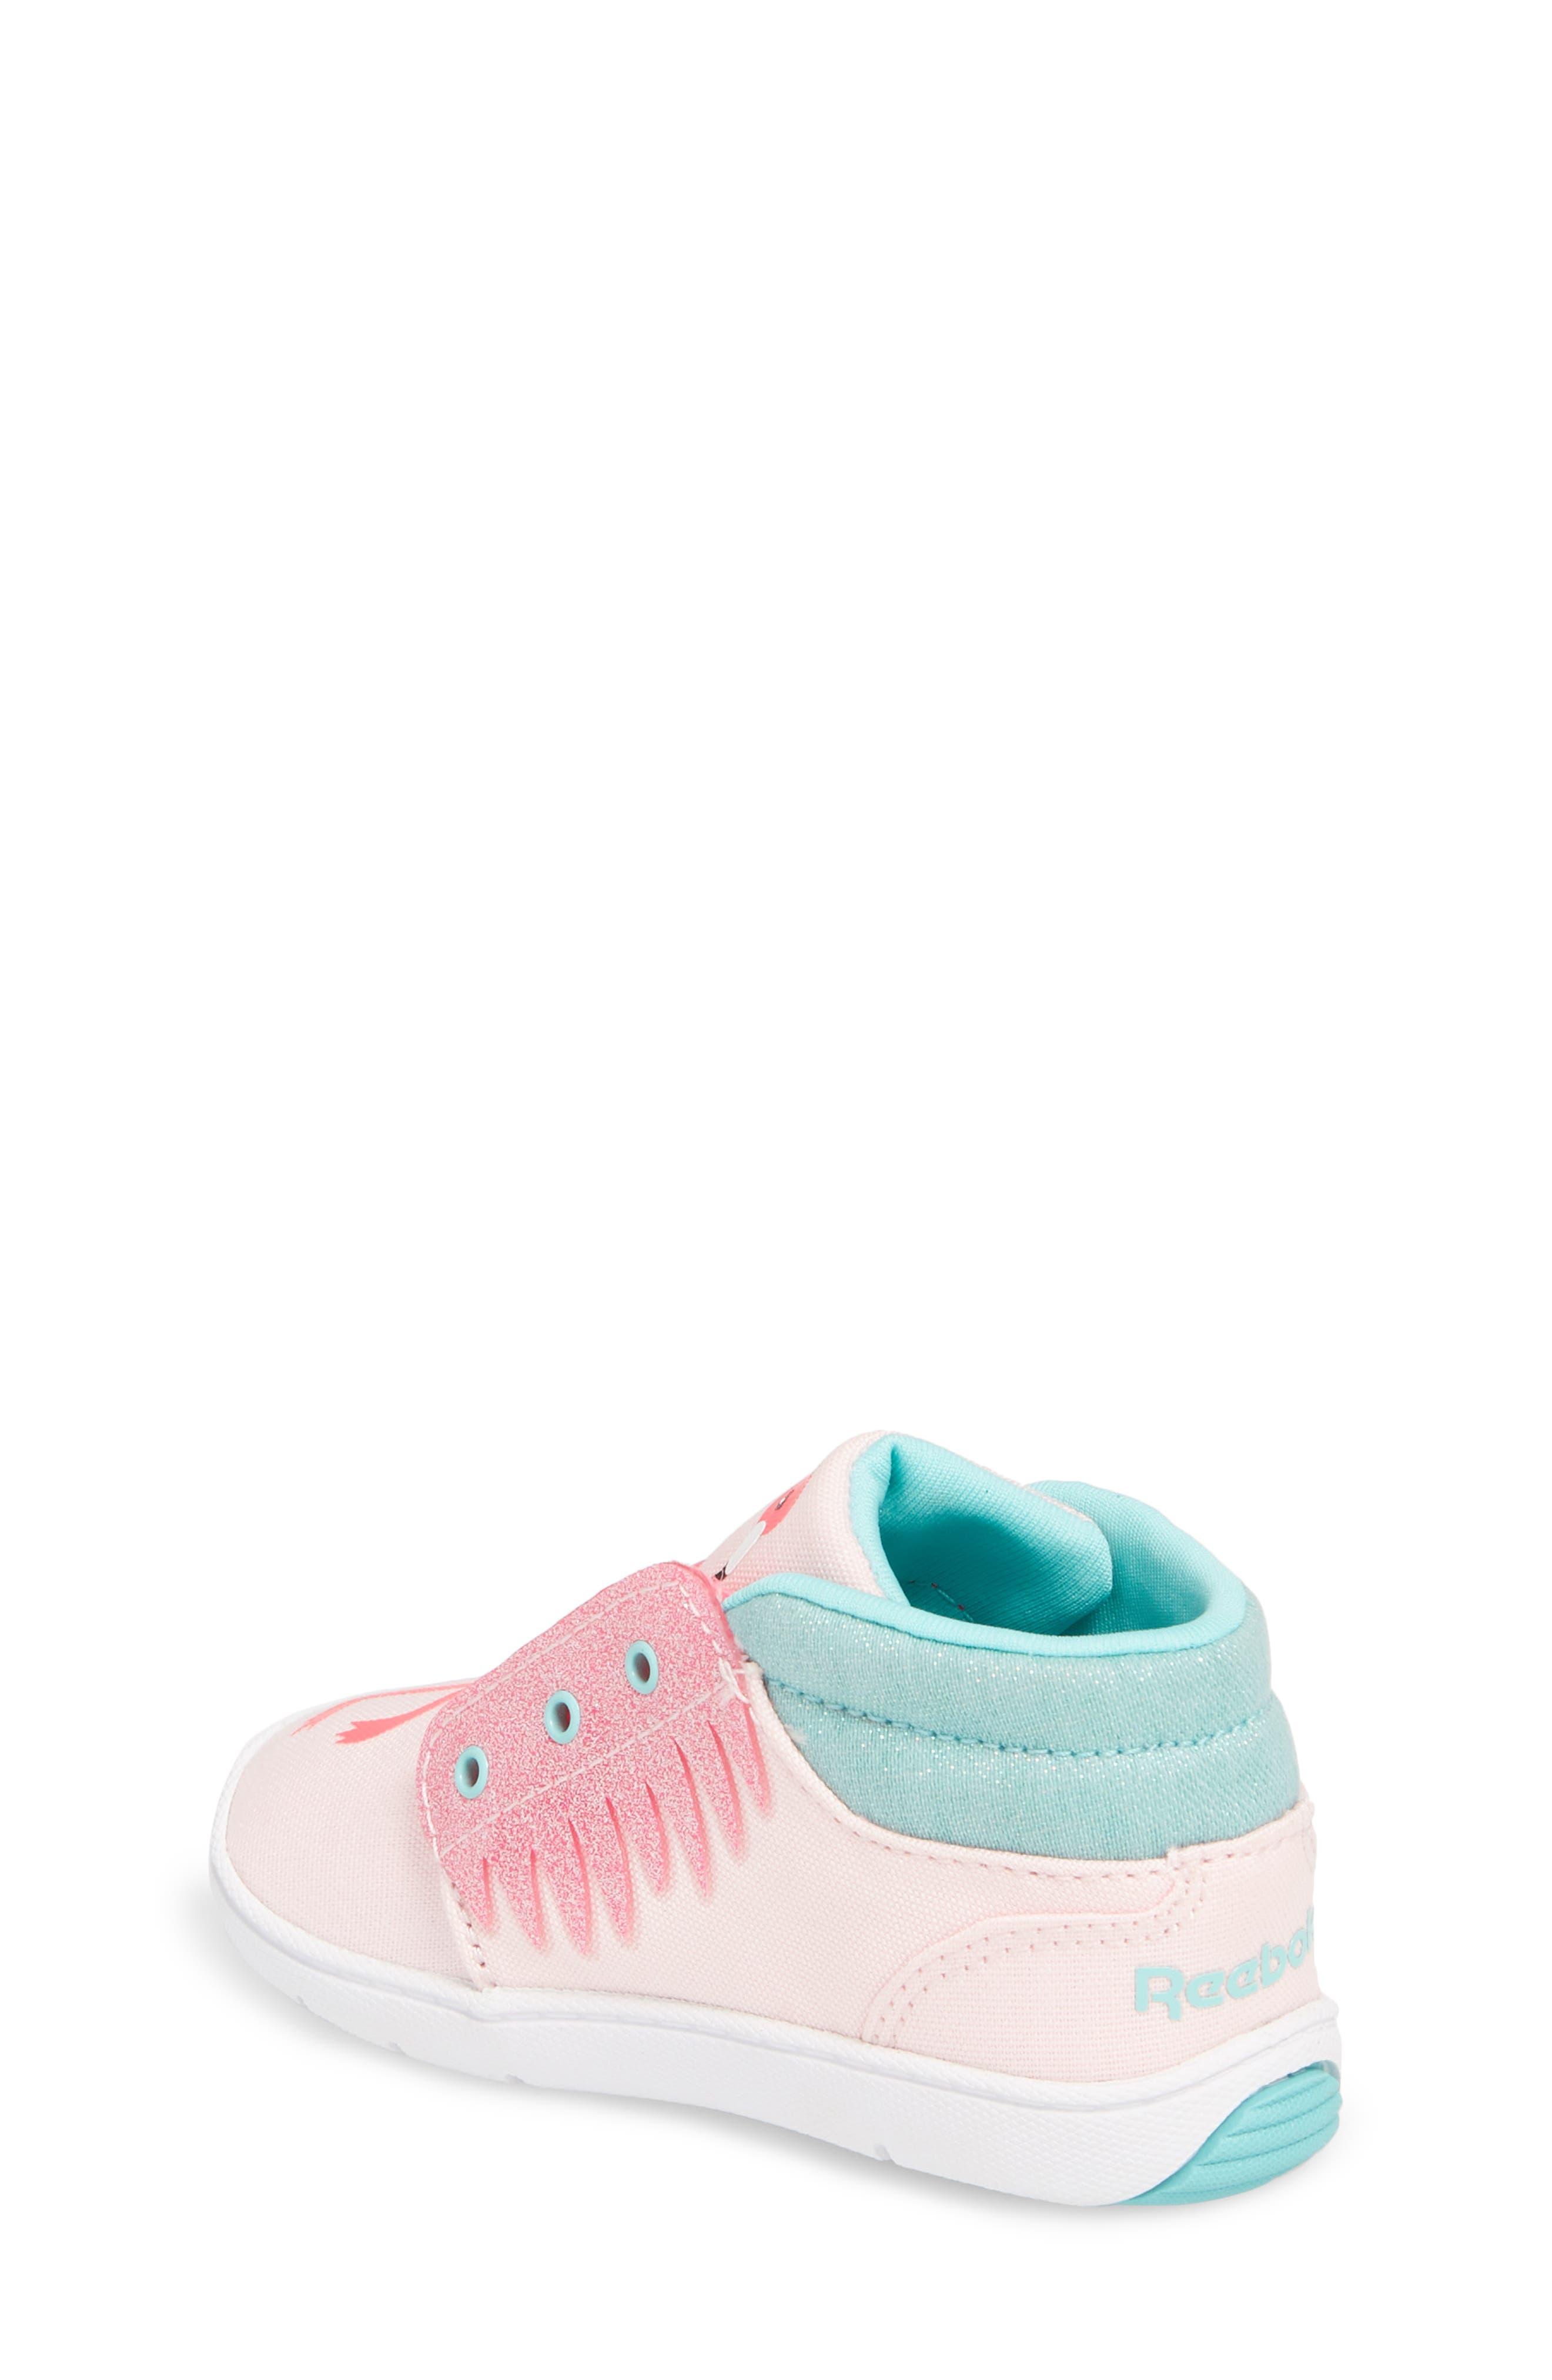 Ventureflex High Top Critter Sneaker,                             Alternate thumbnail 4, color,